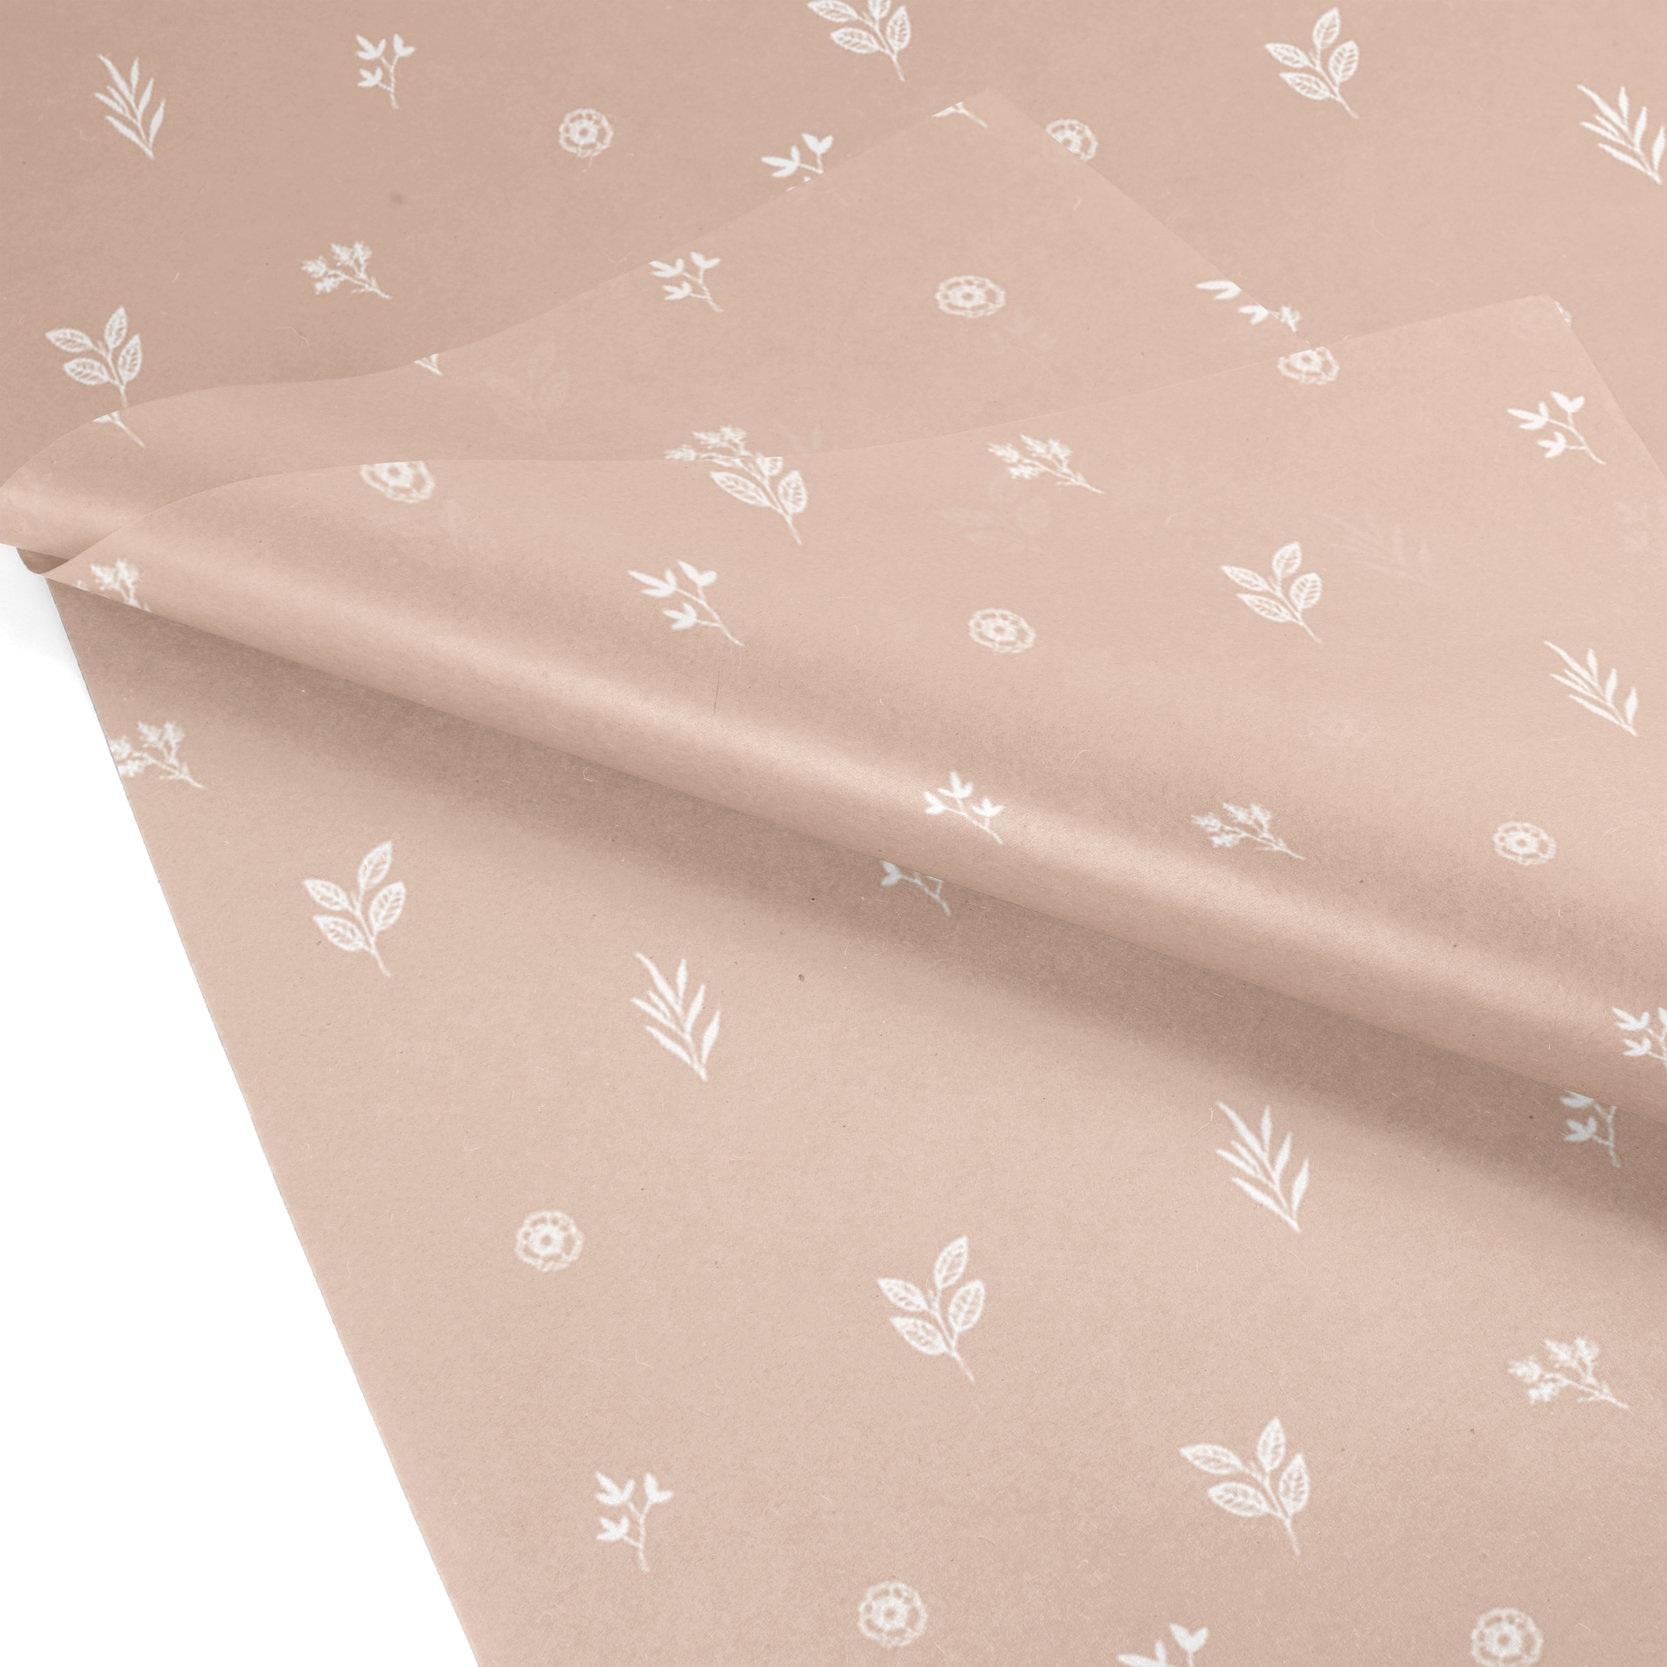 Tissue+Paper+Mockup.jpg